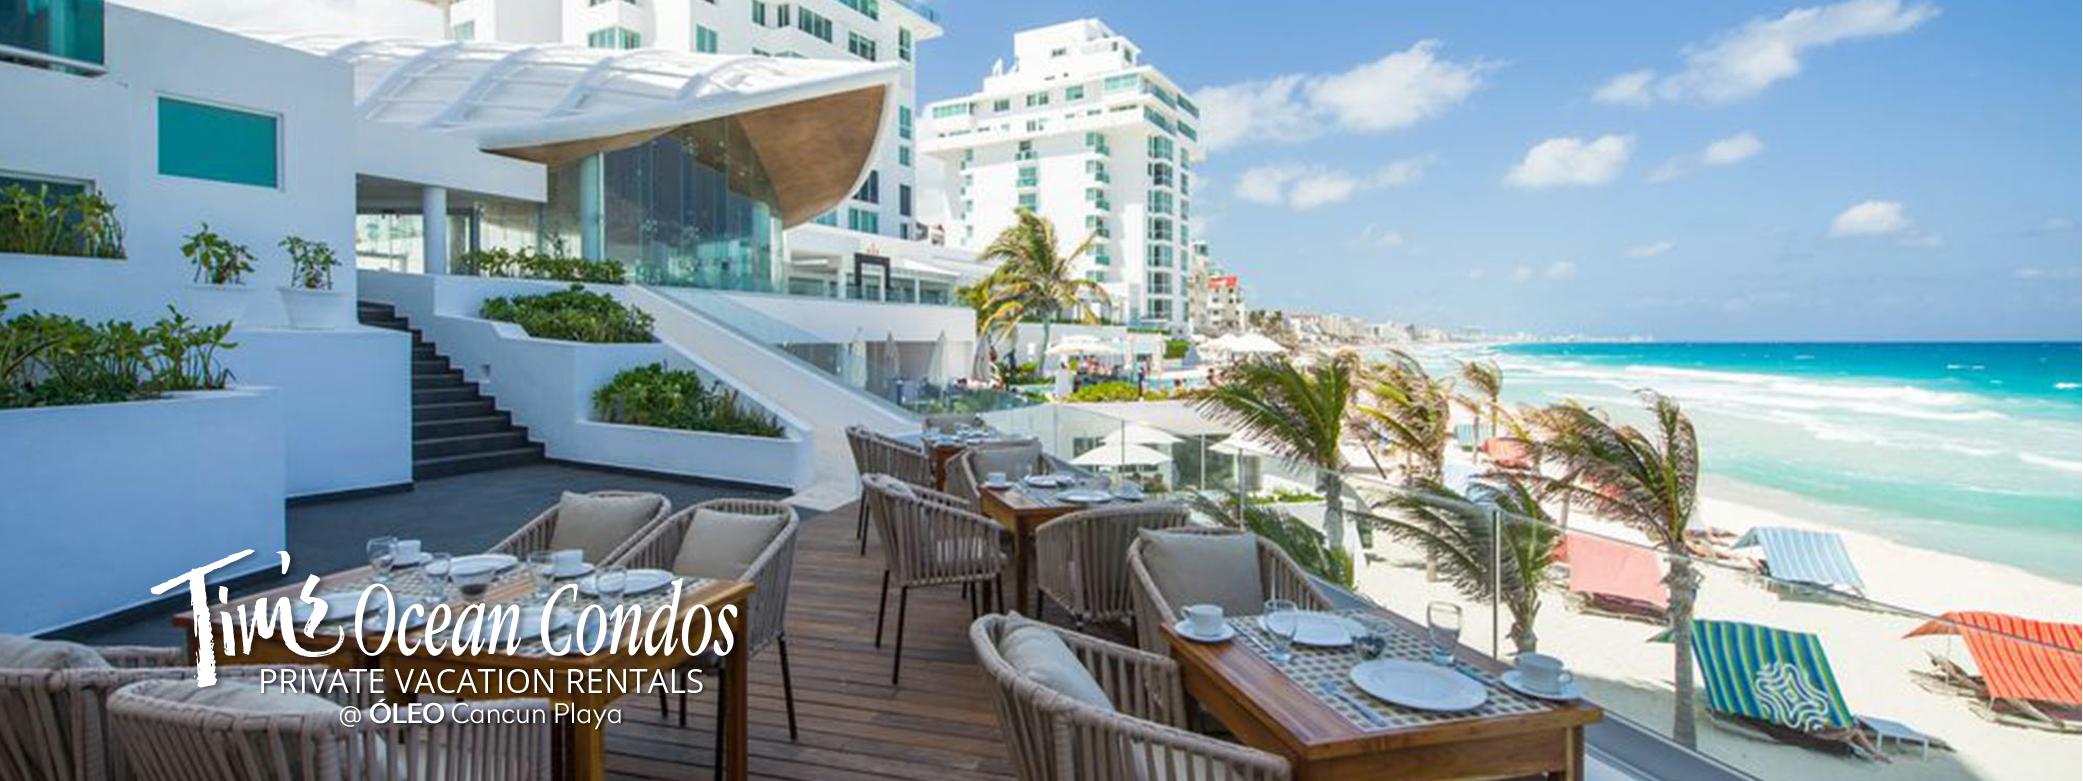 ÓLEO Cancún Playa - Almar Restaurant